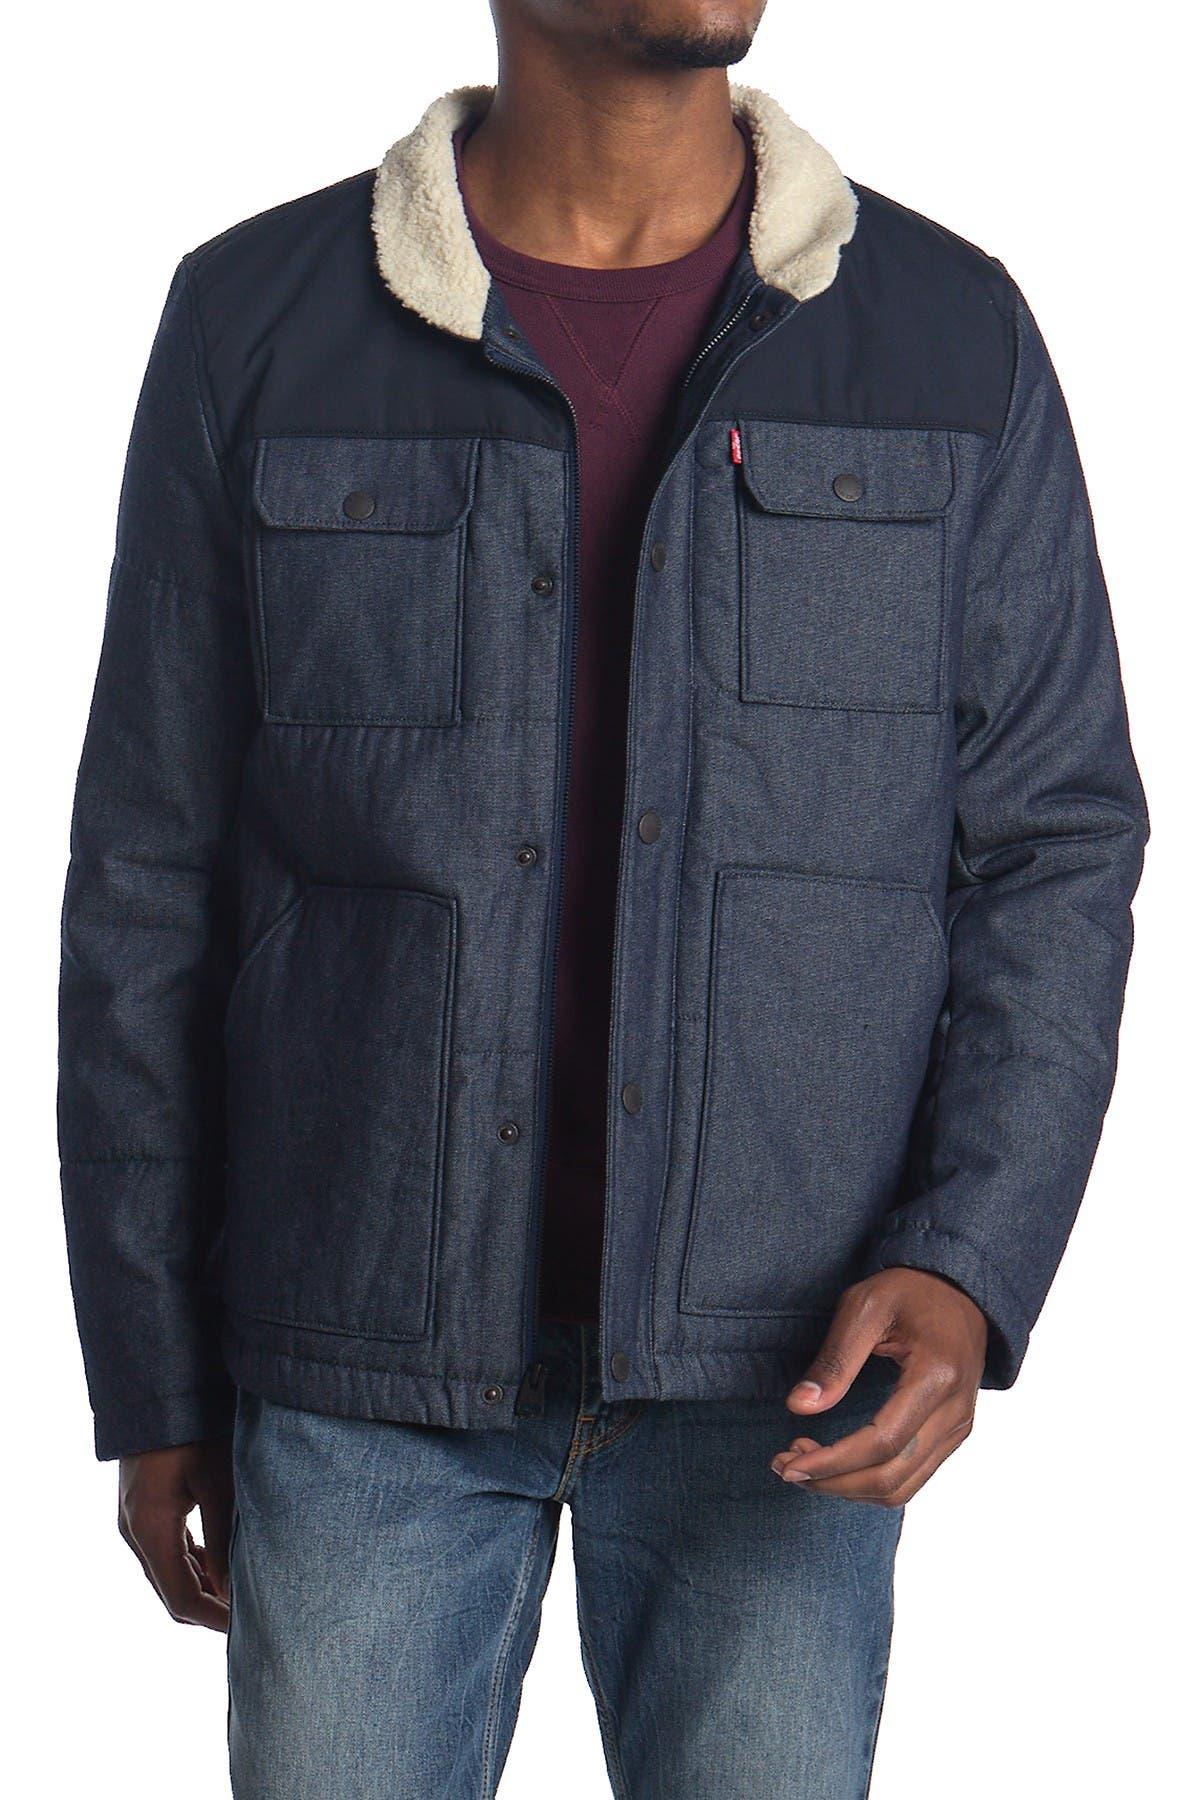 Image of Levi's Faux Shearling Lined Woodsman Jacket